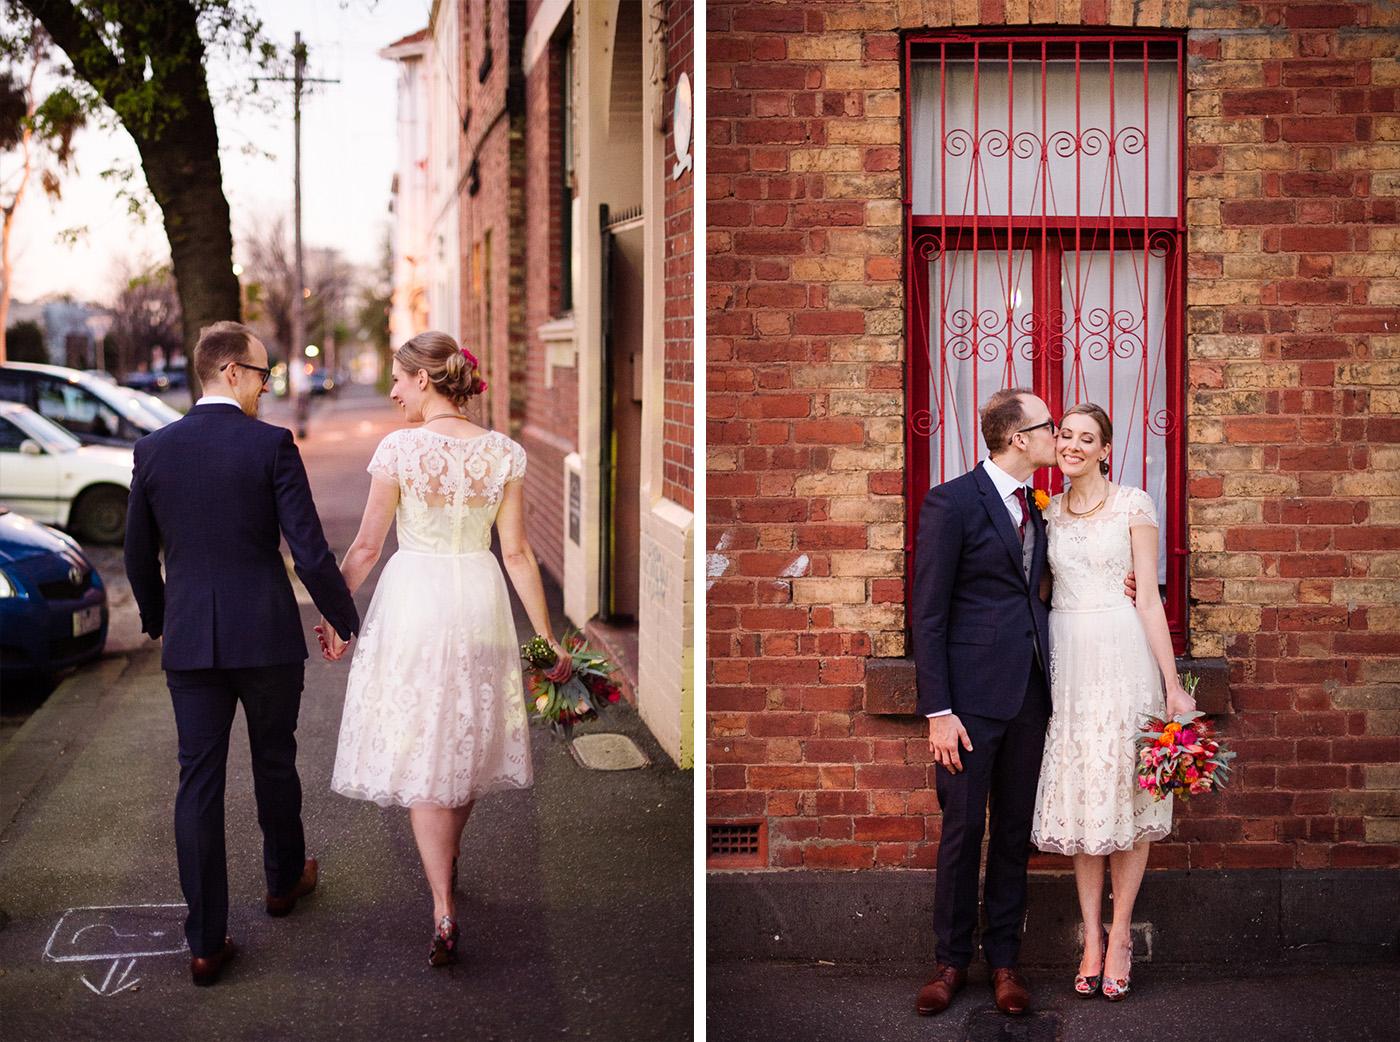 Fitzroy-townhall-wedding-photos-159